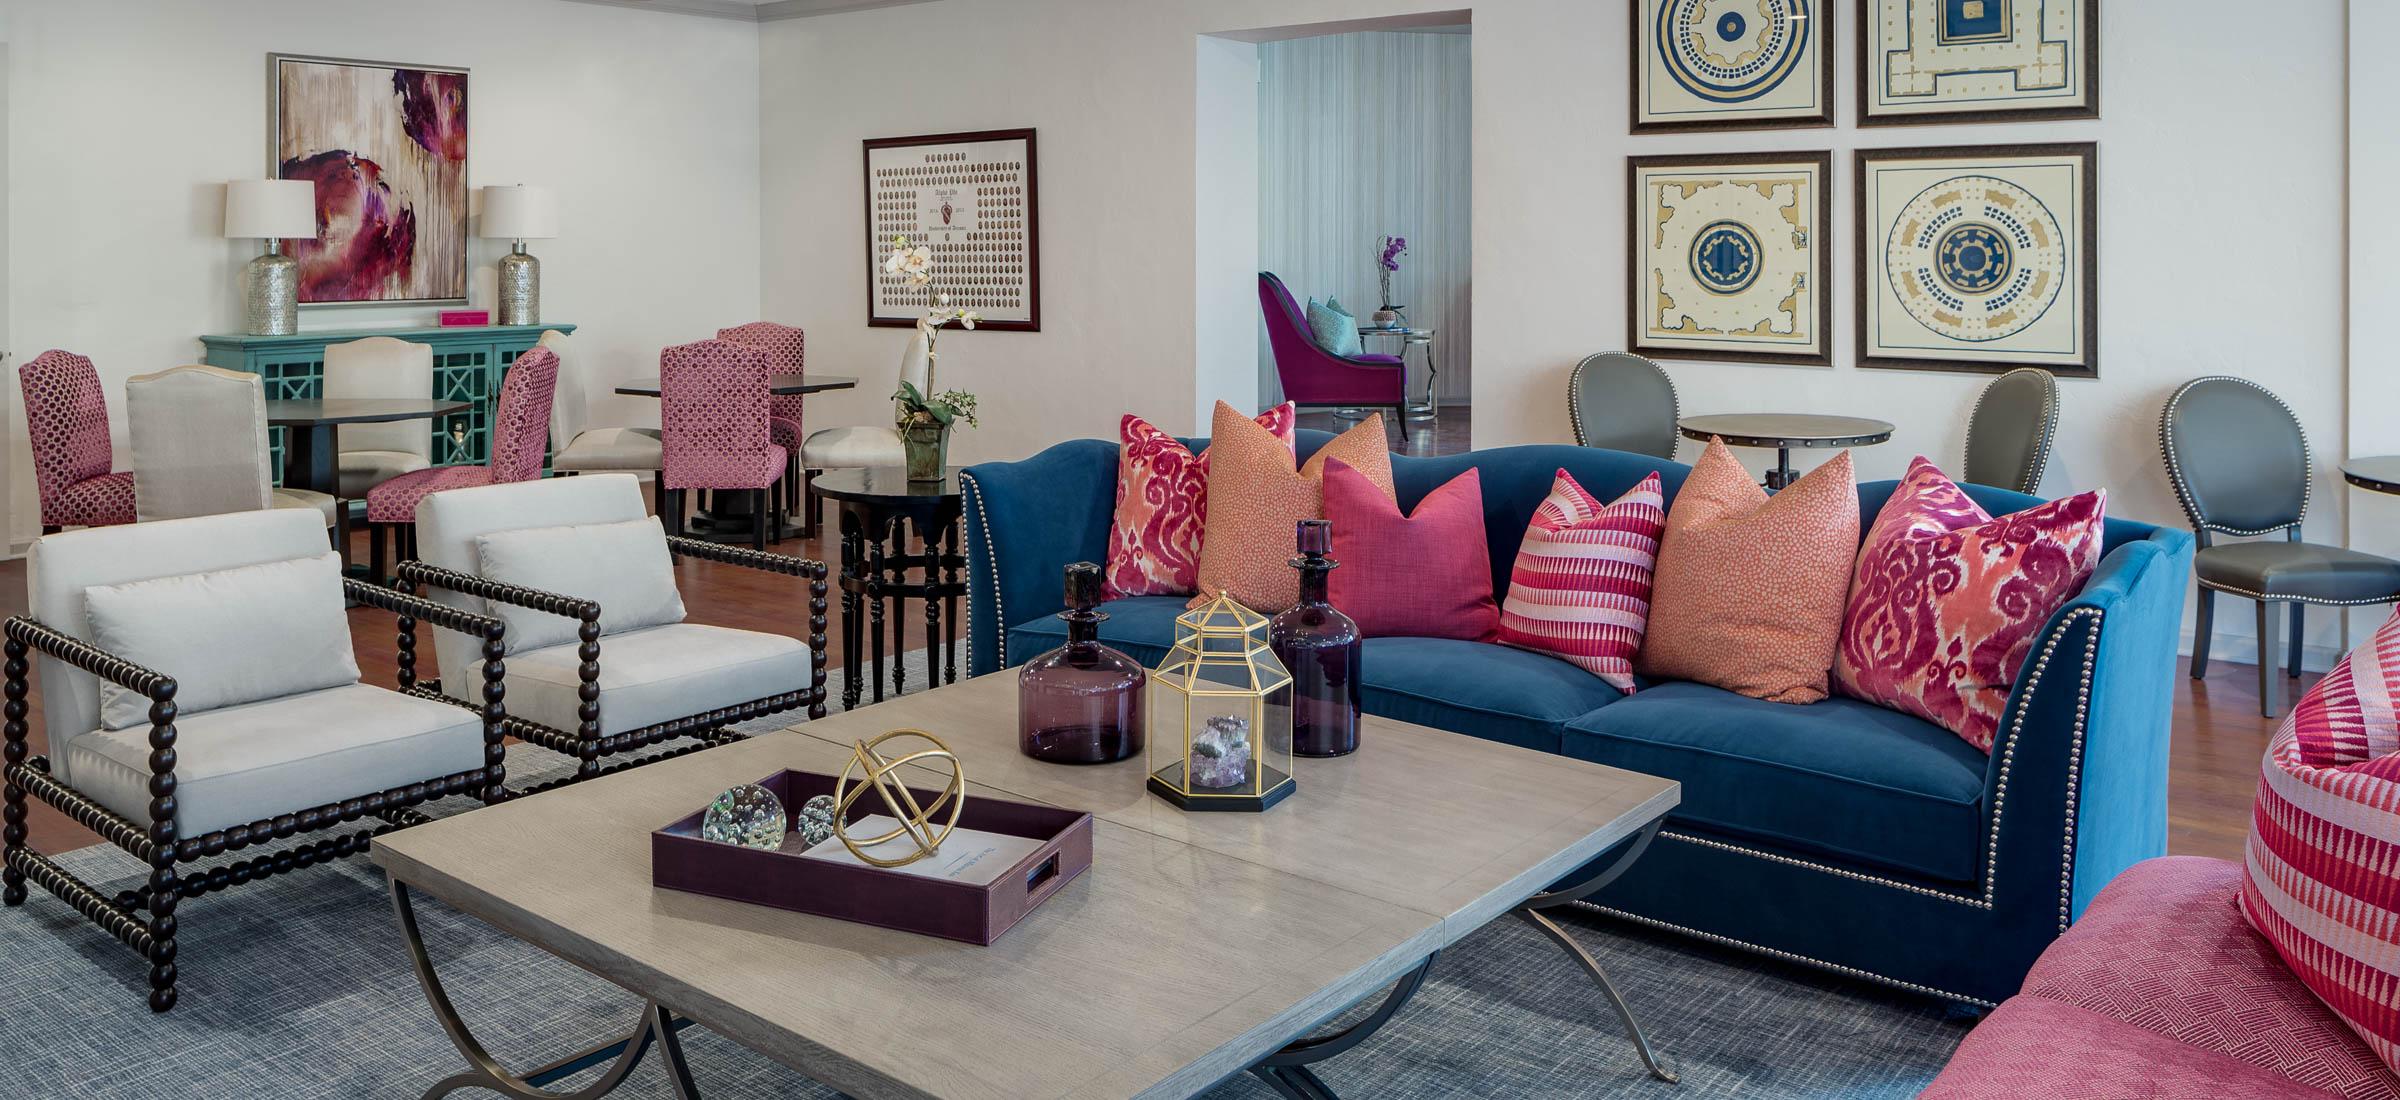 Interiors for University of arizona interior design